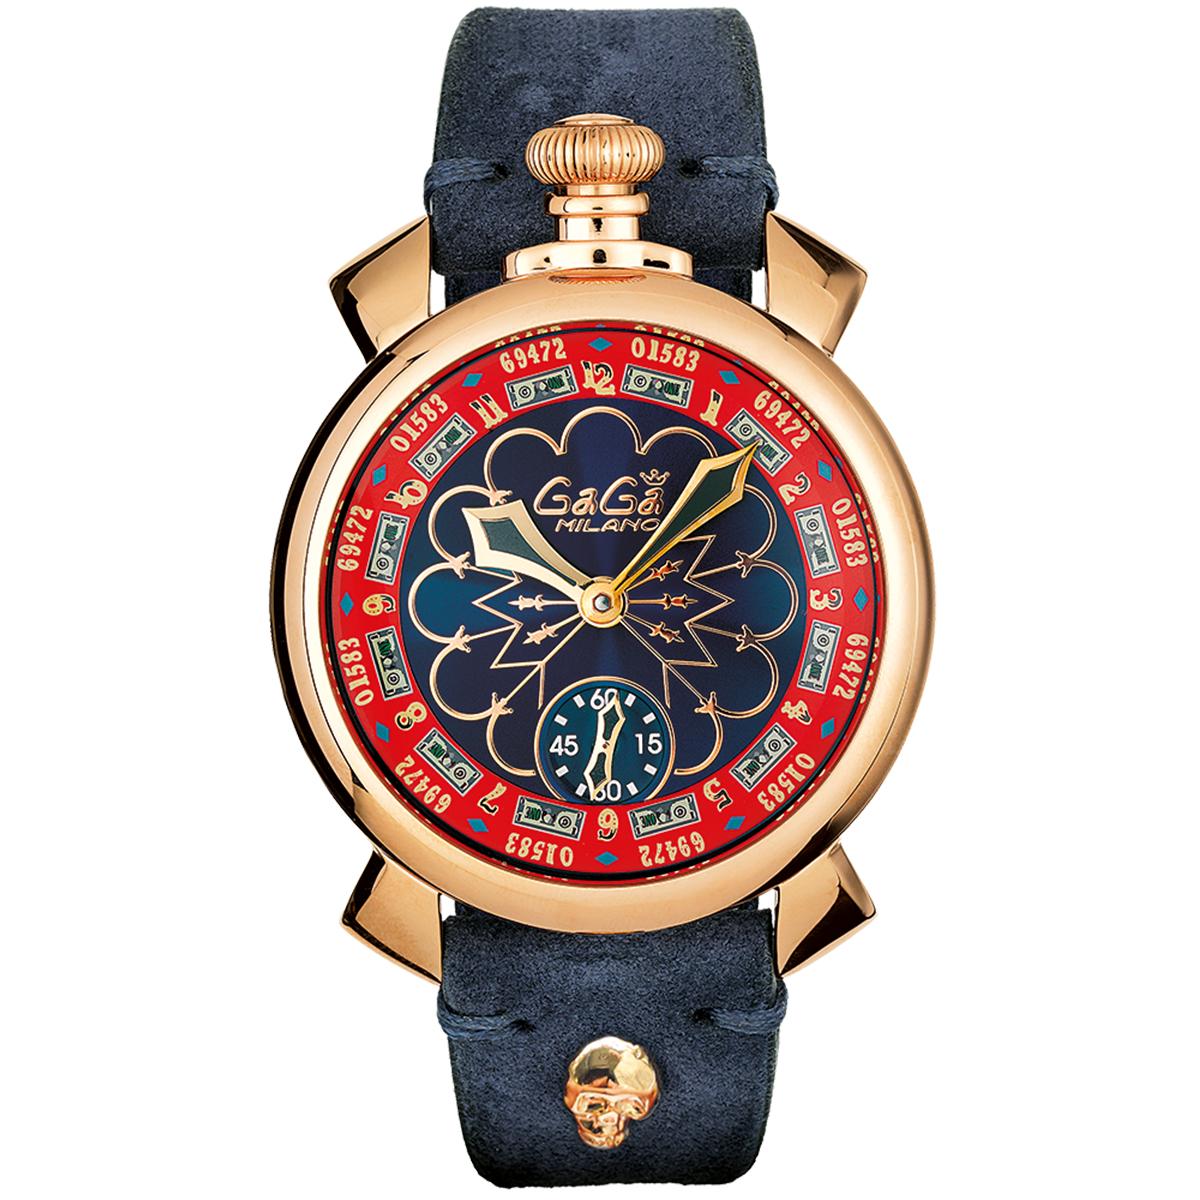 GAGA MILANO ガガ ミラノ 5011-LV-2 MANUALE  マヌアーレ ユニセックス 時計 腕時計[あす楽]